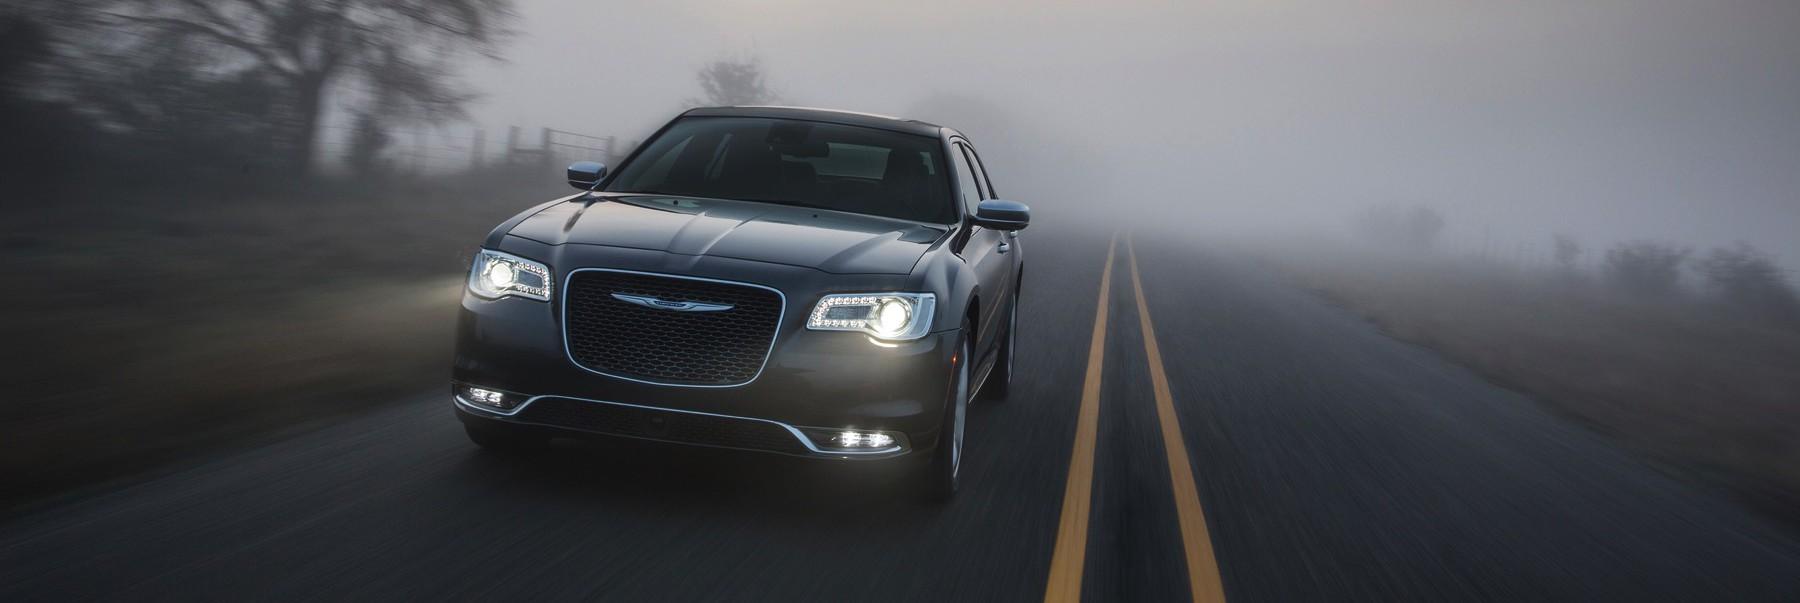 2017 Chrysler 300c reviewed by David Boldt – txGarage